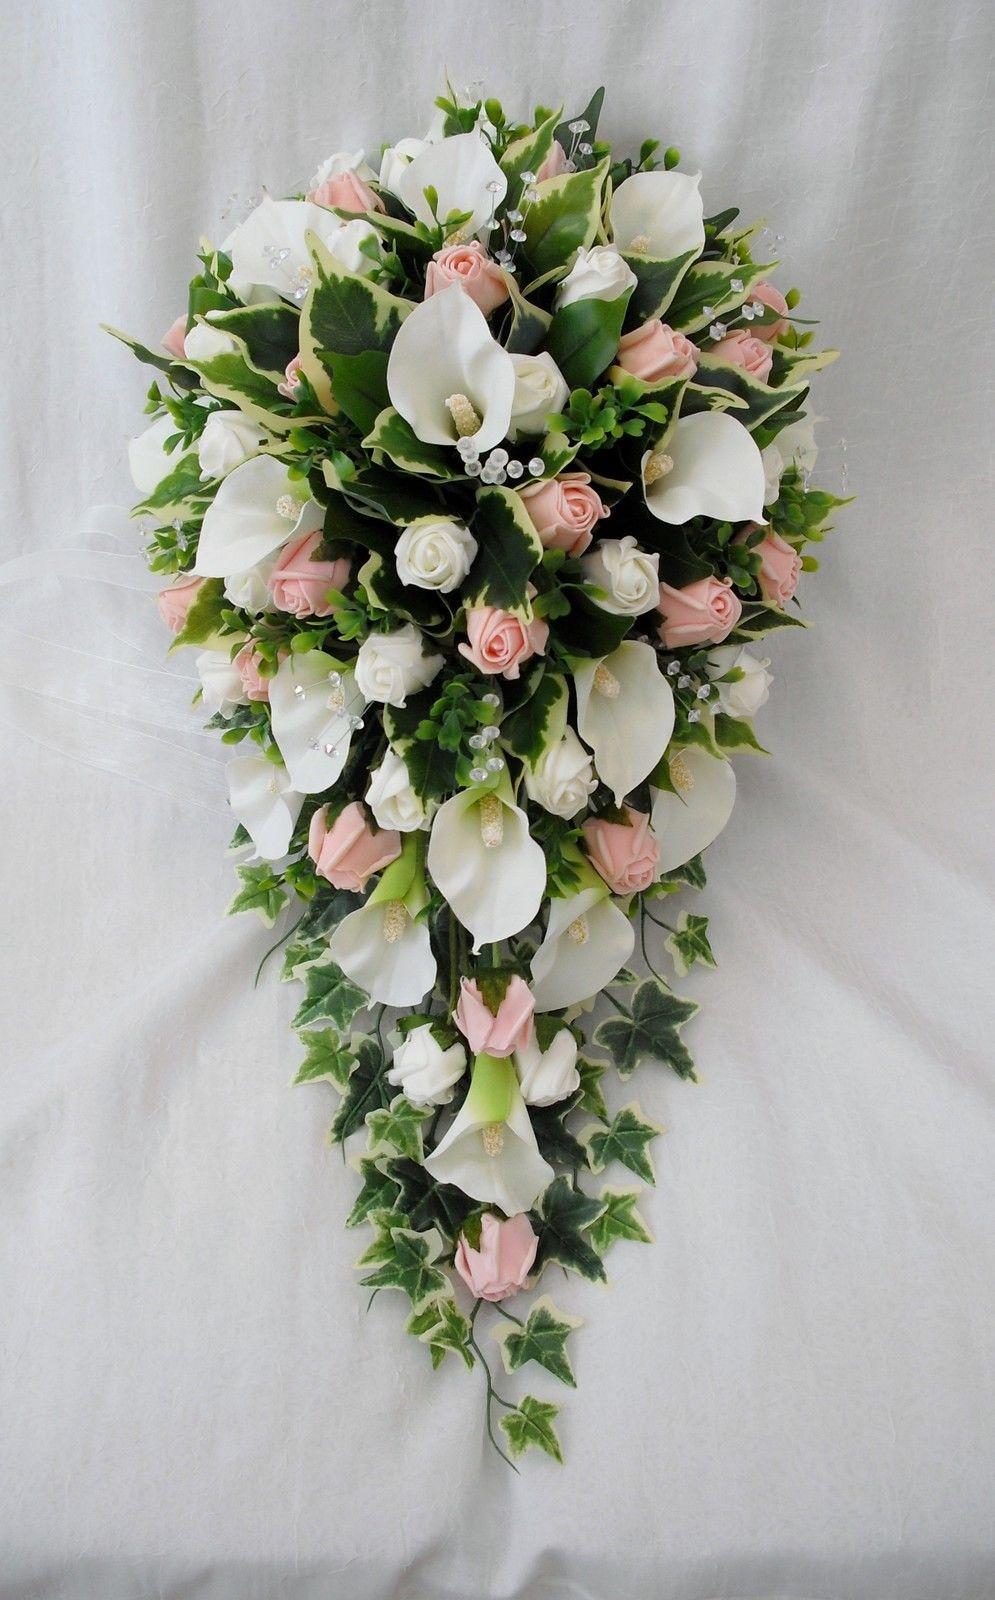 Artificial Wedding Flower Packages Bouquet Artificial Wedding Flowers Bouquets Brides Bouqu In 2020 Wedding Flower Packages Cheap Wedding Bouquets Fake Wedding Flowers